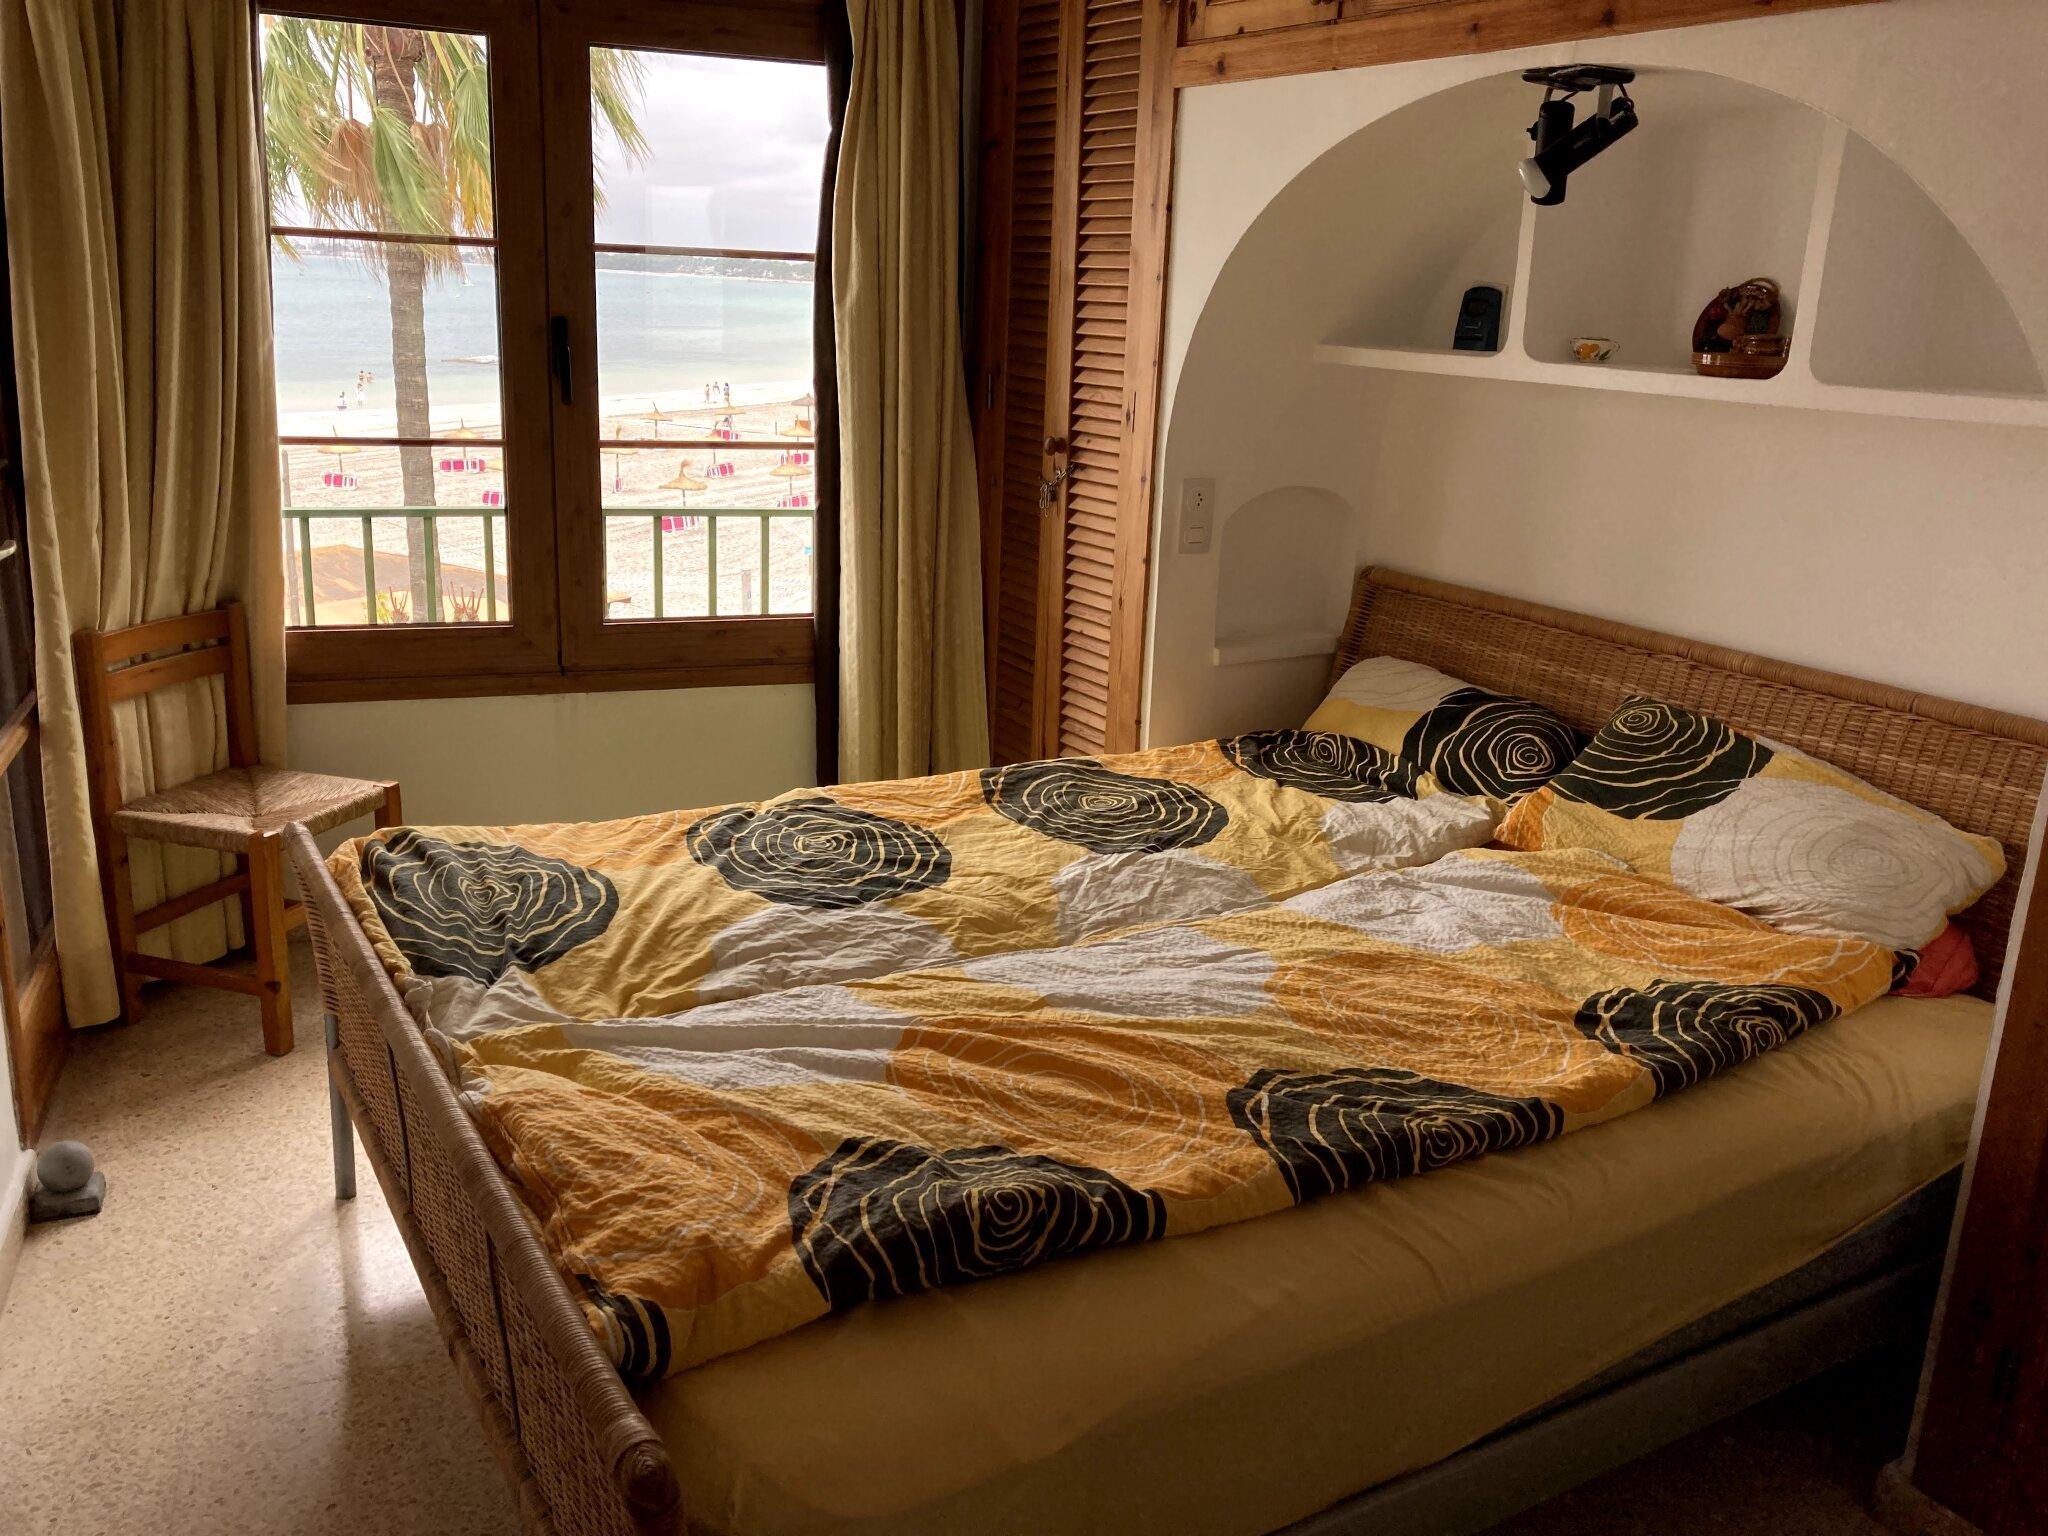 Schlafzimmer m. Balkonzugang & Meerblick